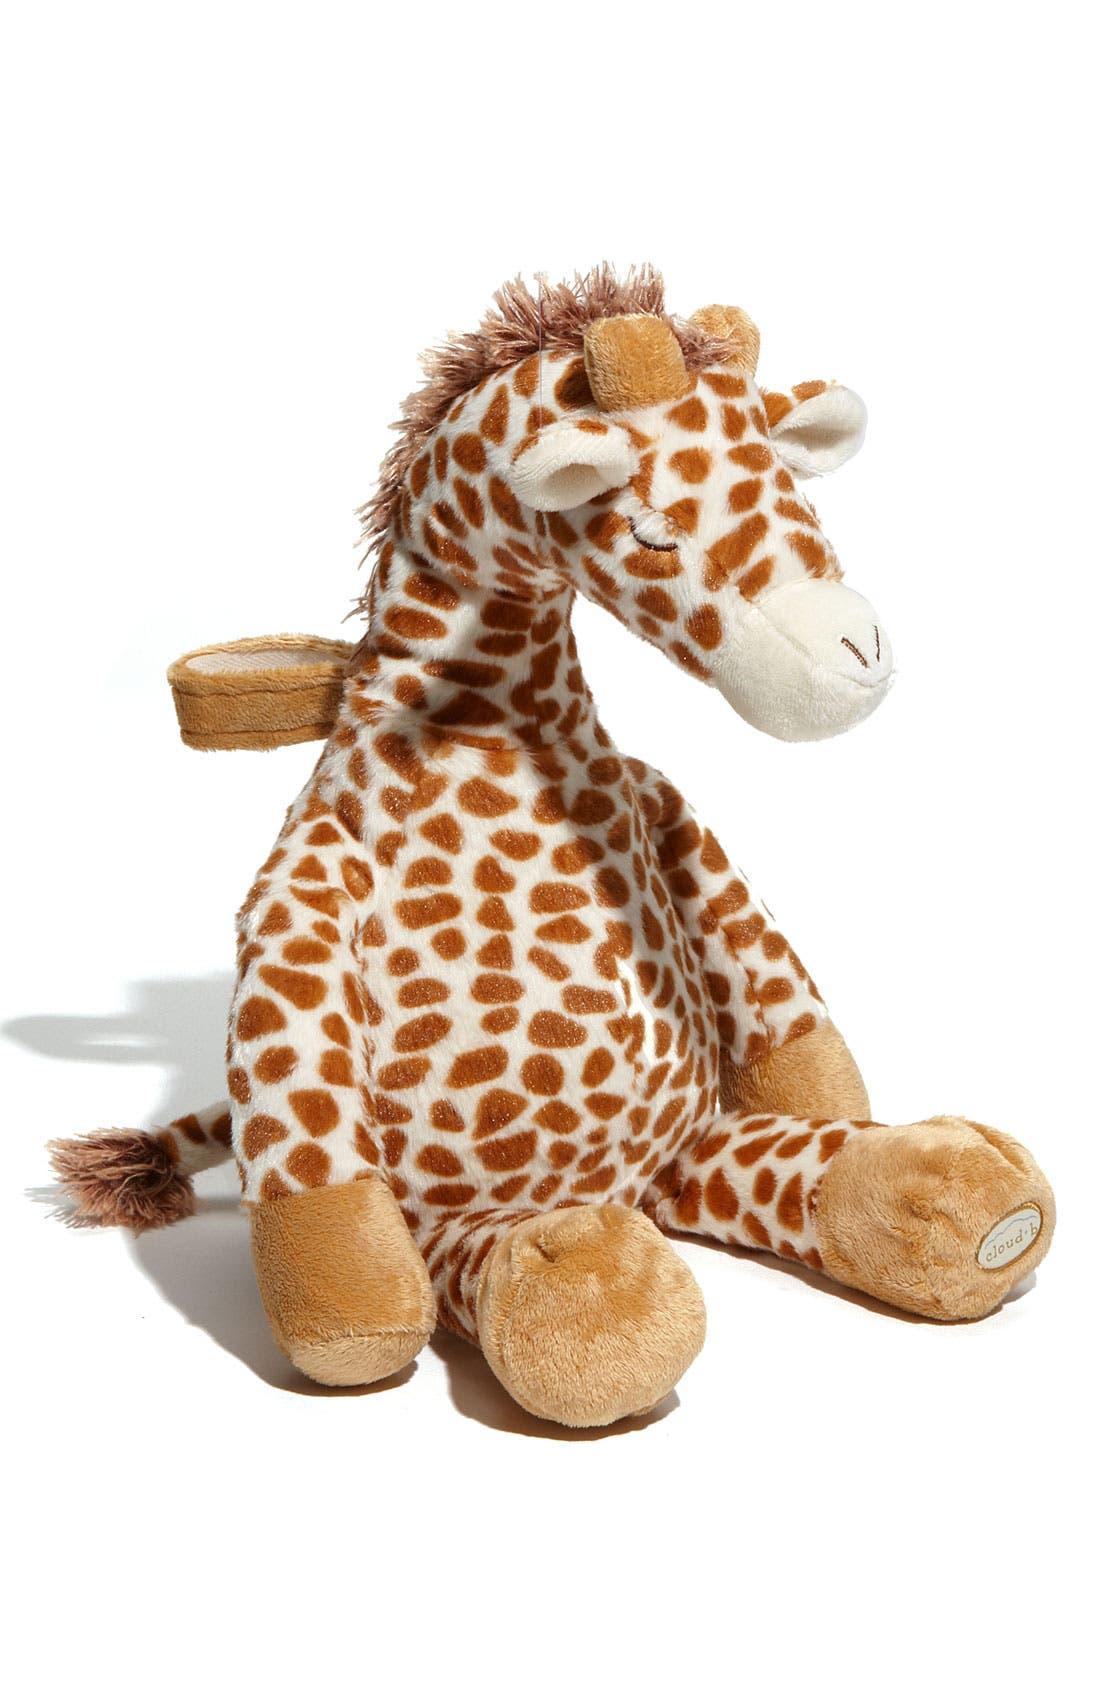 Main Image - Cloud B 'Gentle Giraffe' Stuffed Animal